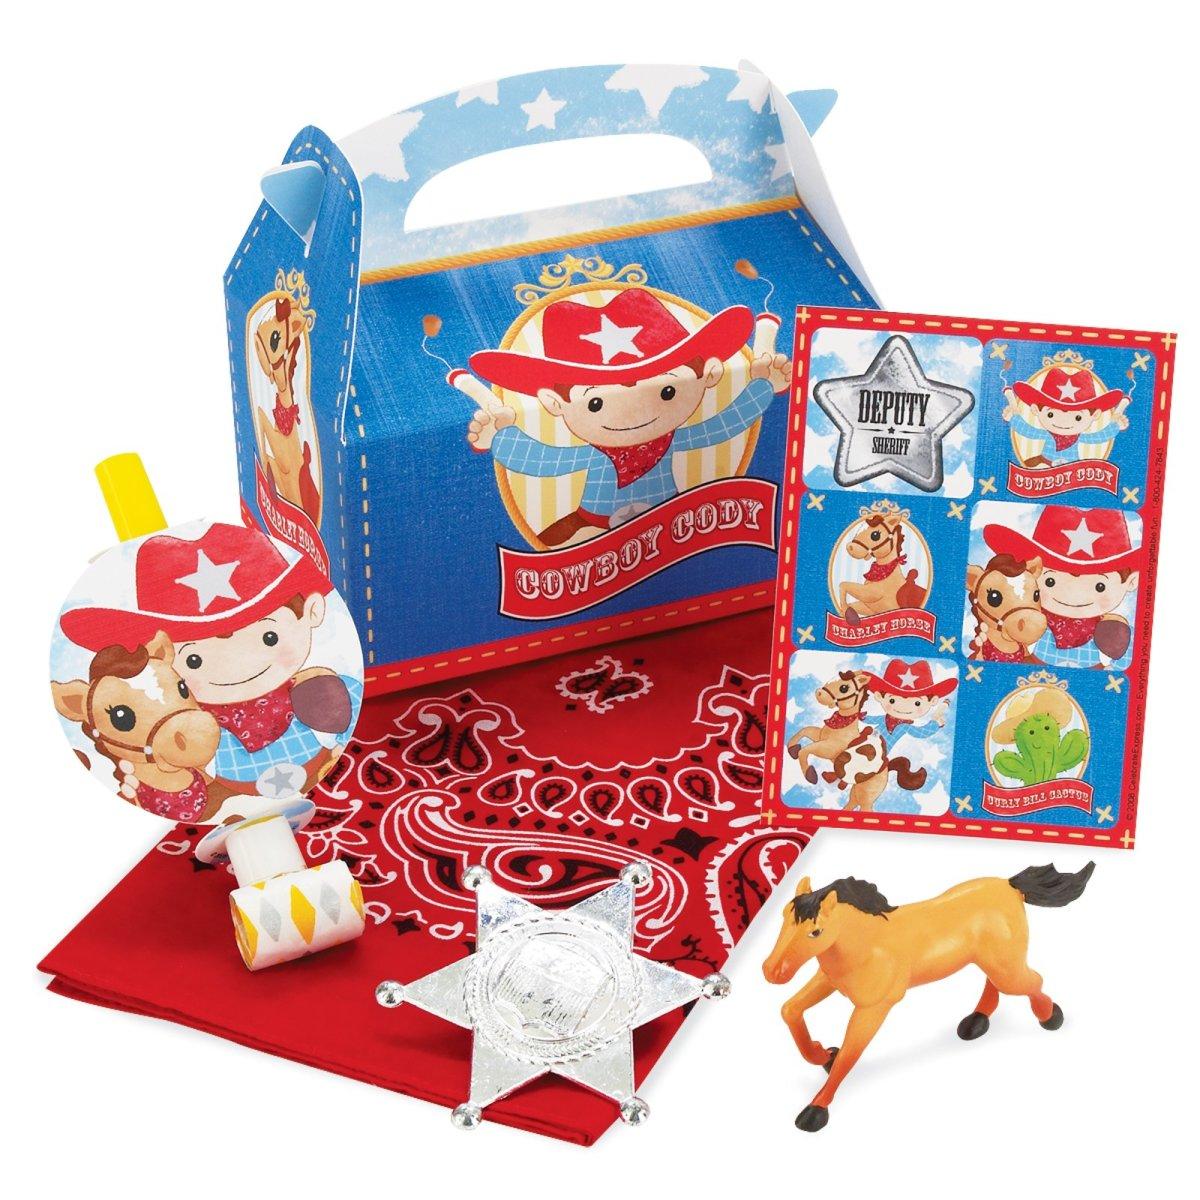 Cowboy Favor Box